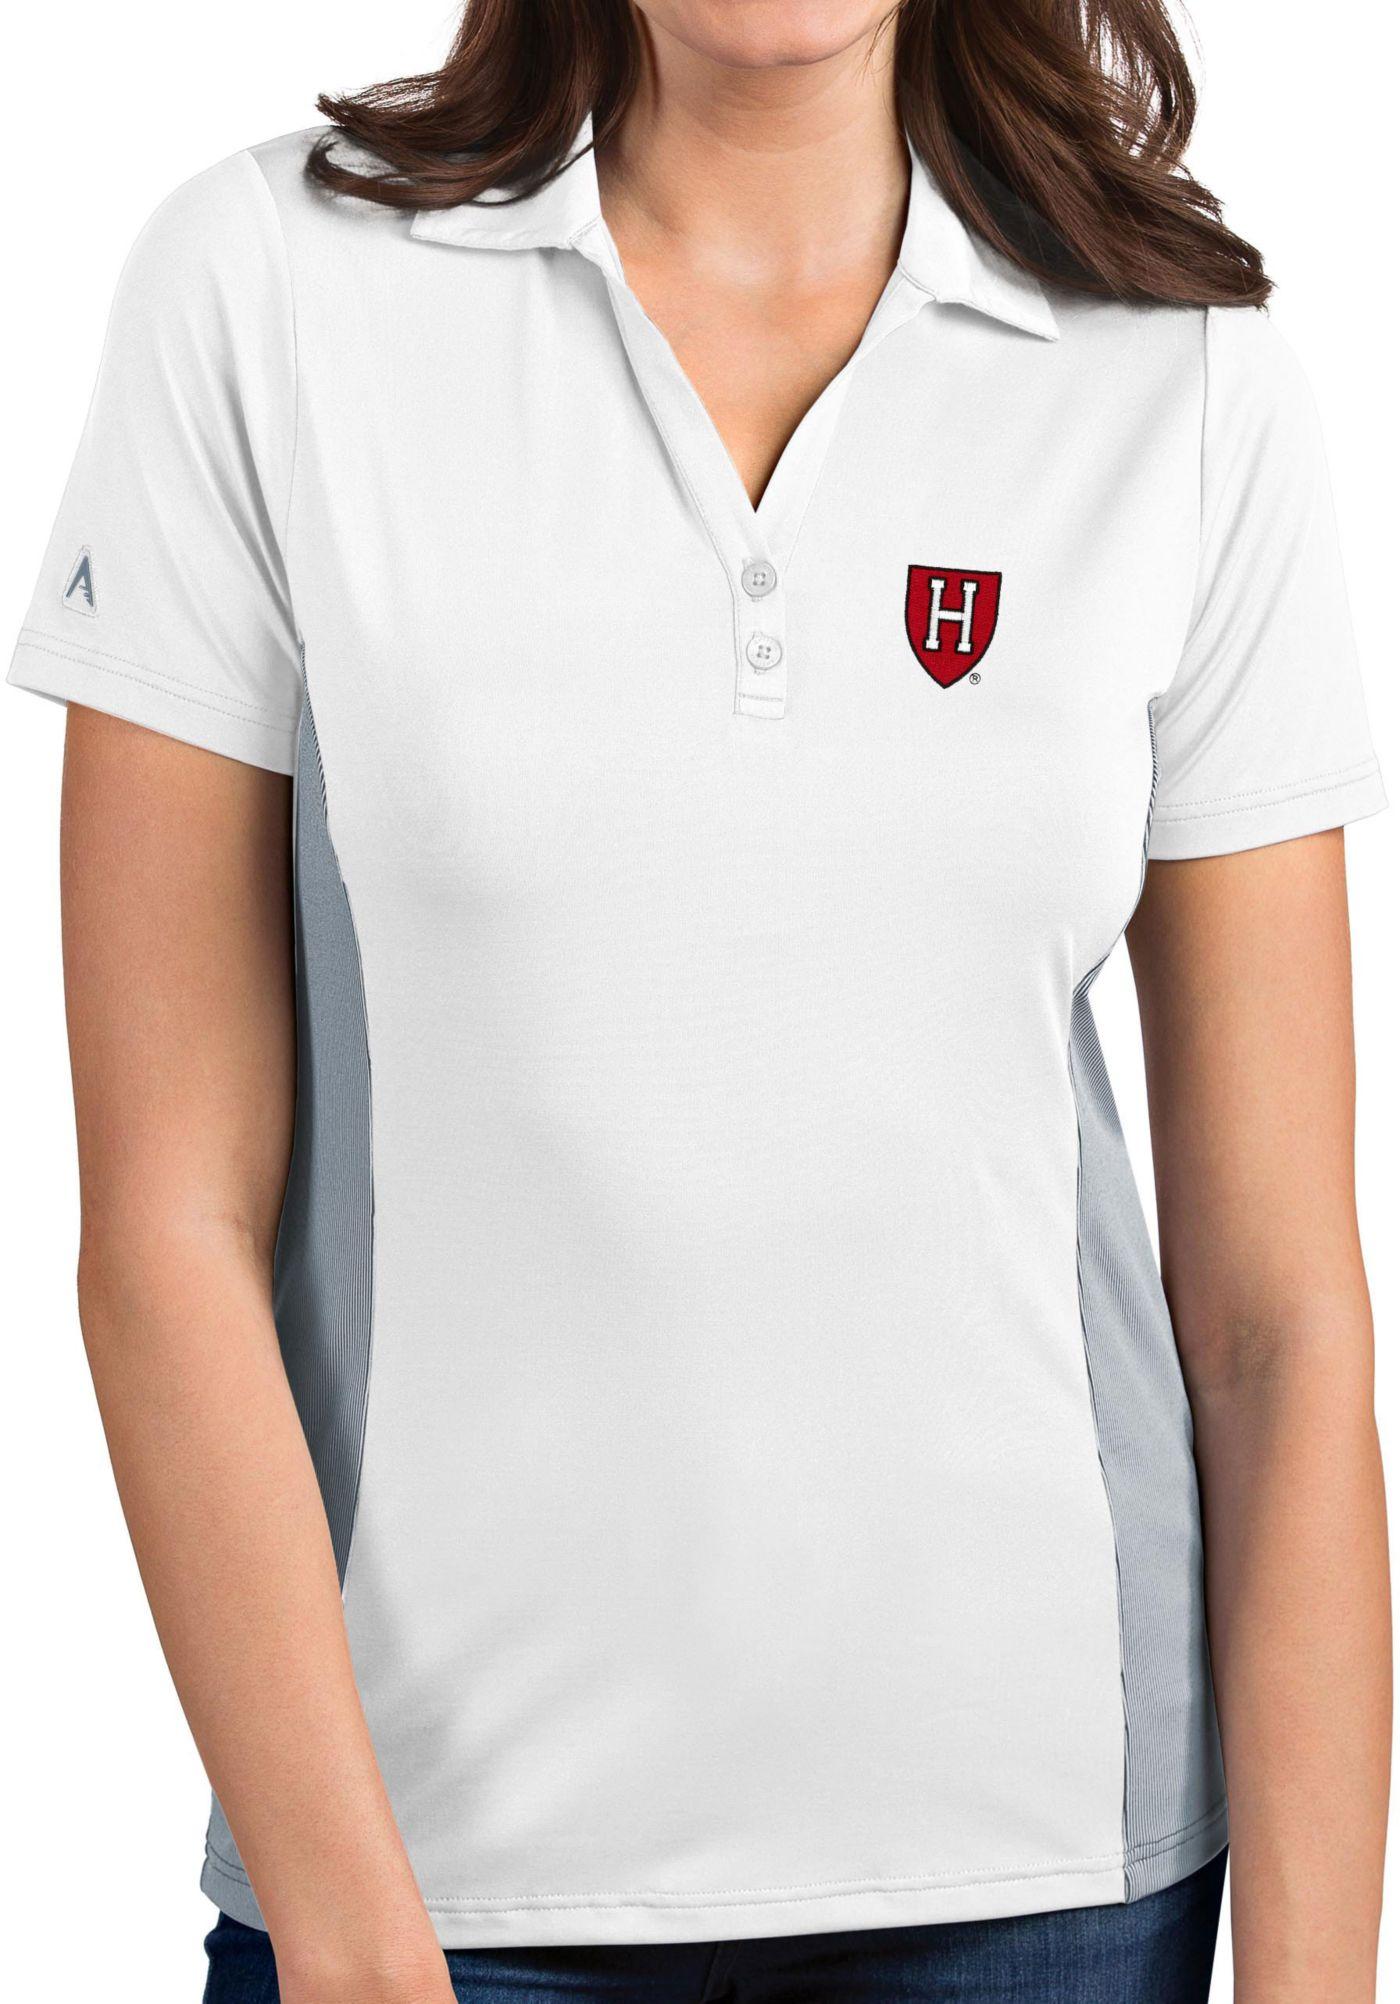 Antigua Women's Harvard Crimson Venture White Polo